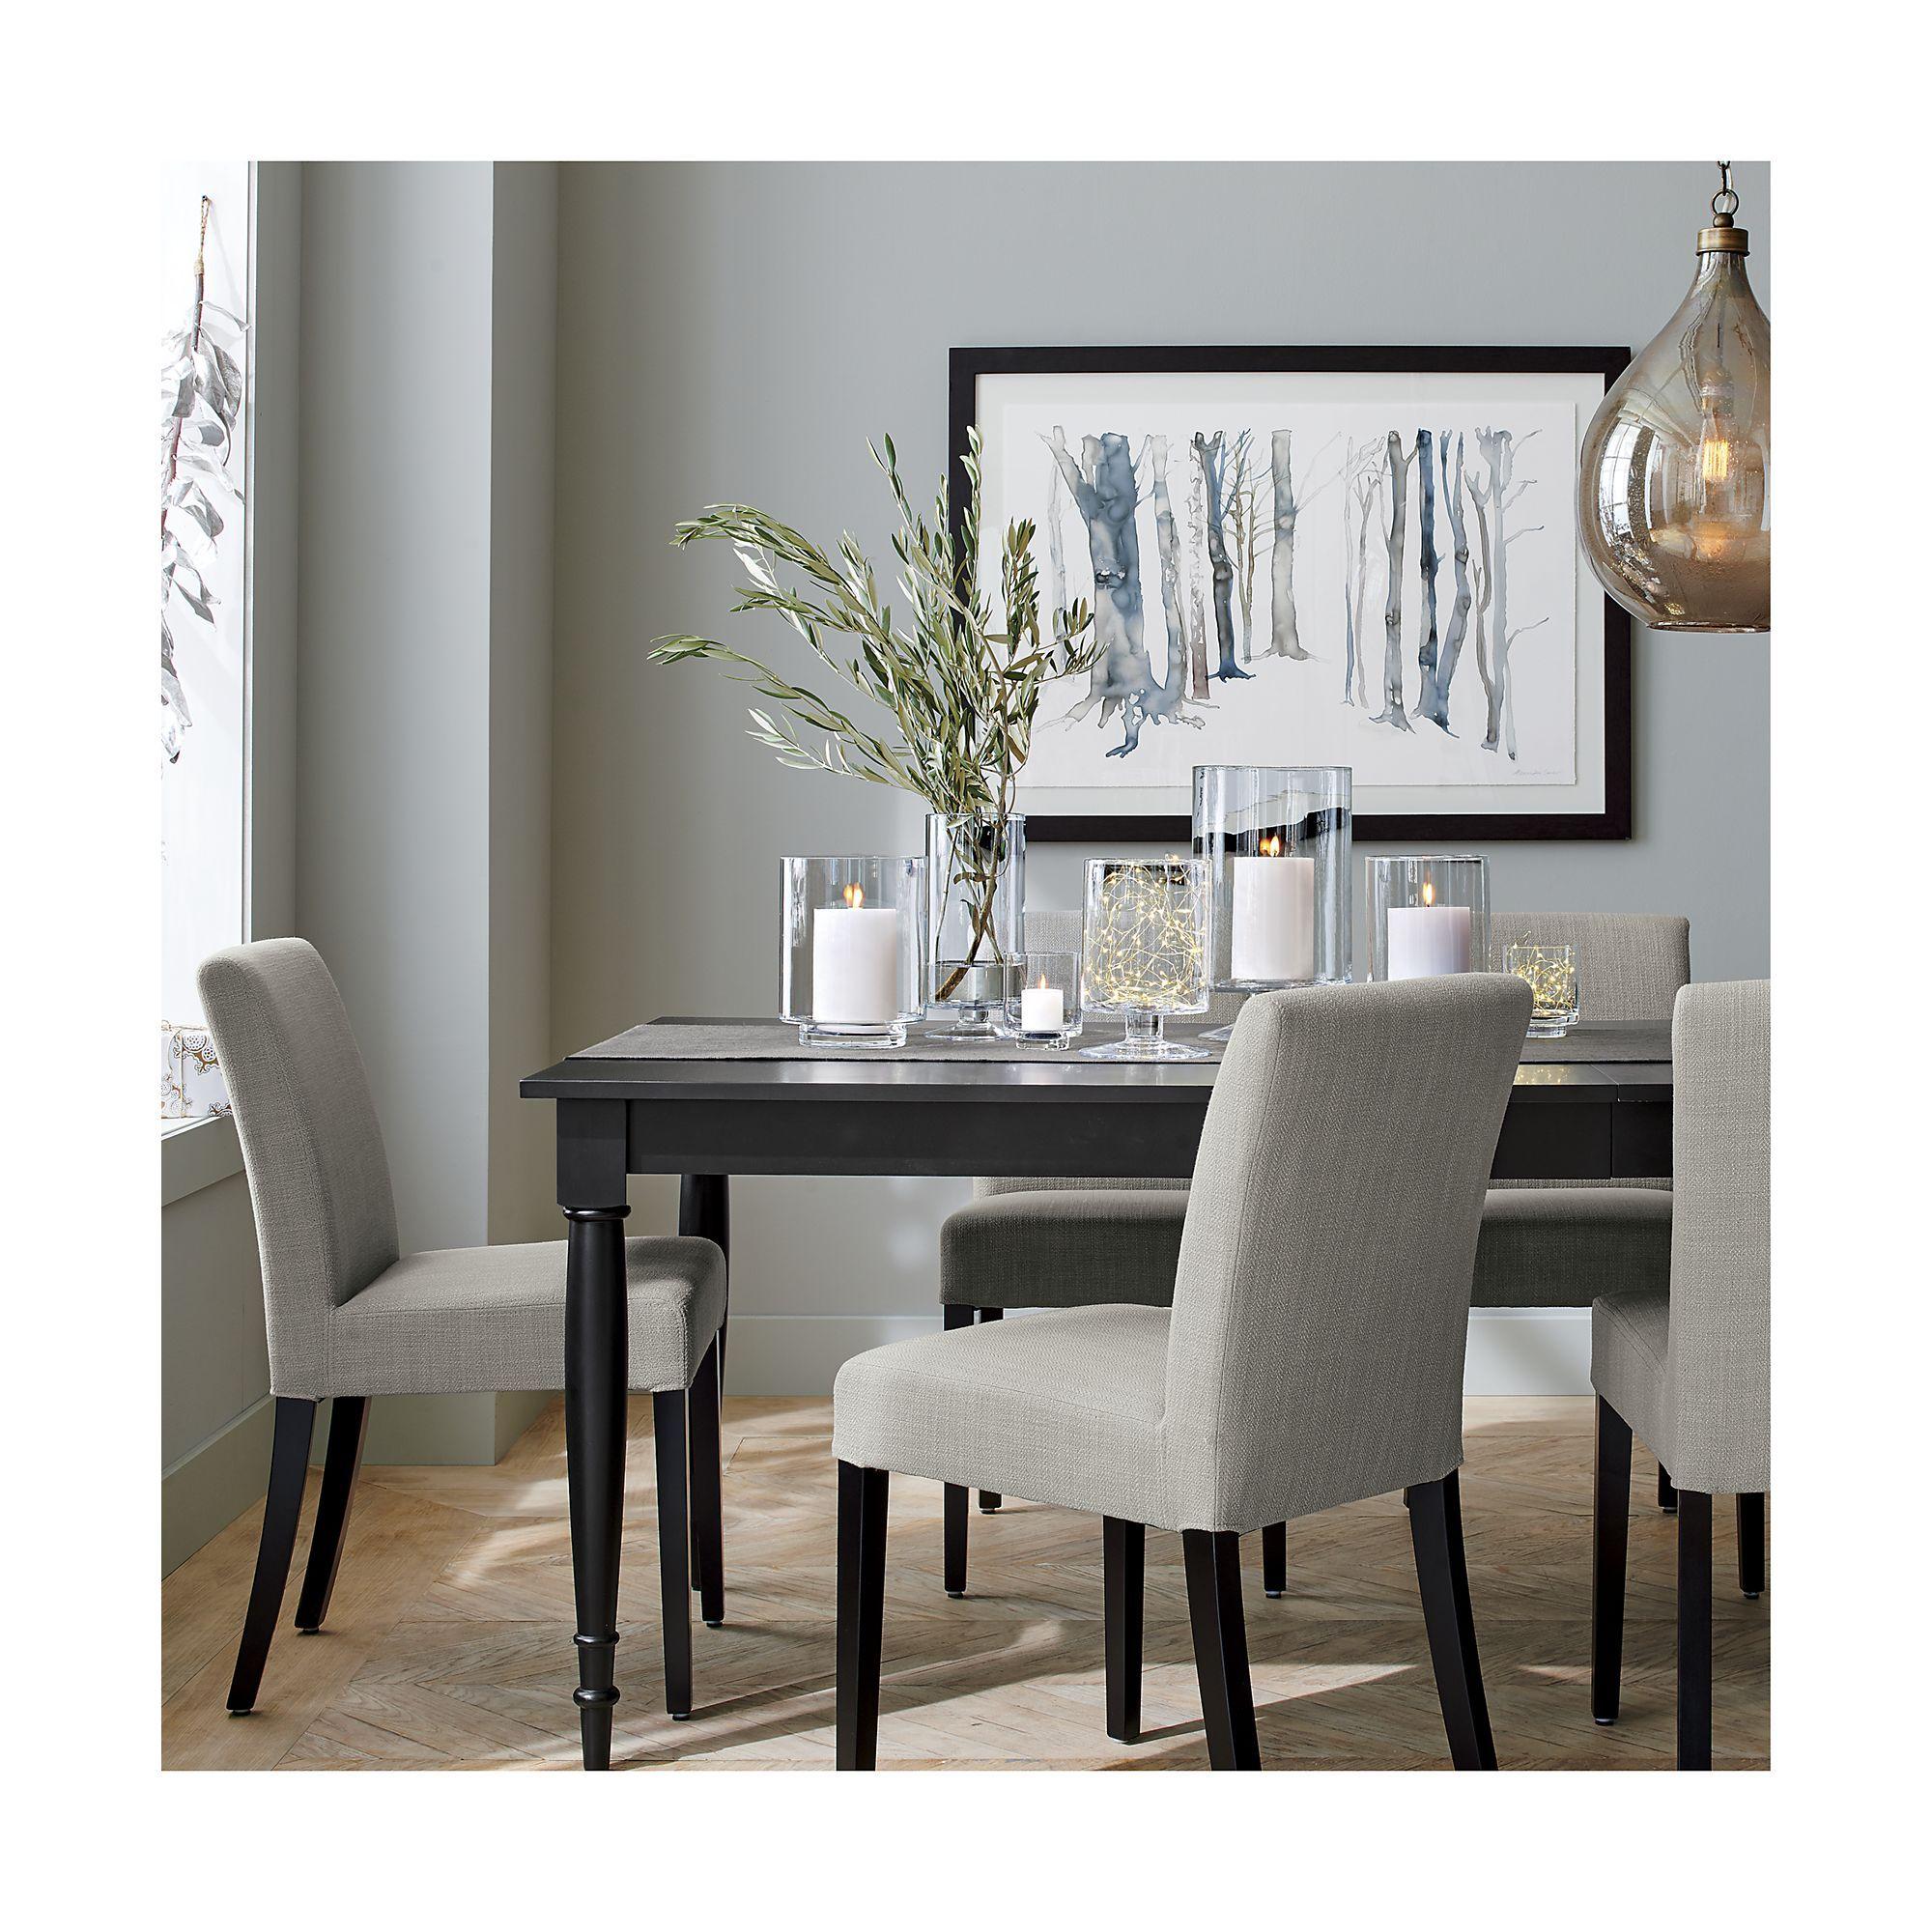 Twinkle silver string lights in interior ideas pinterest